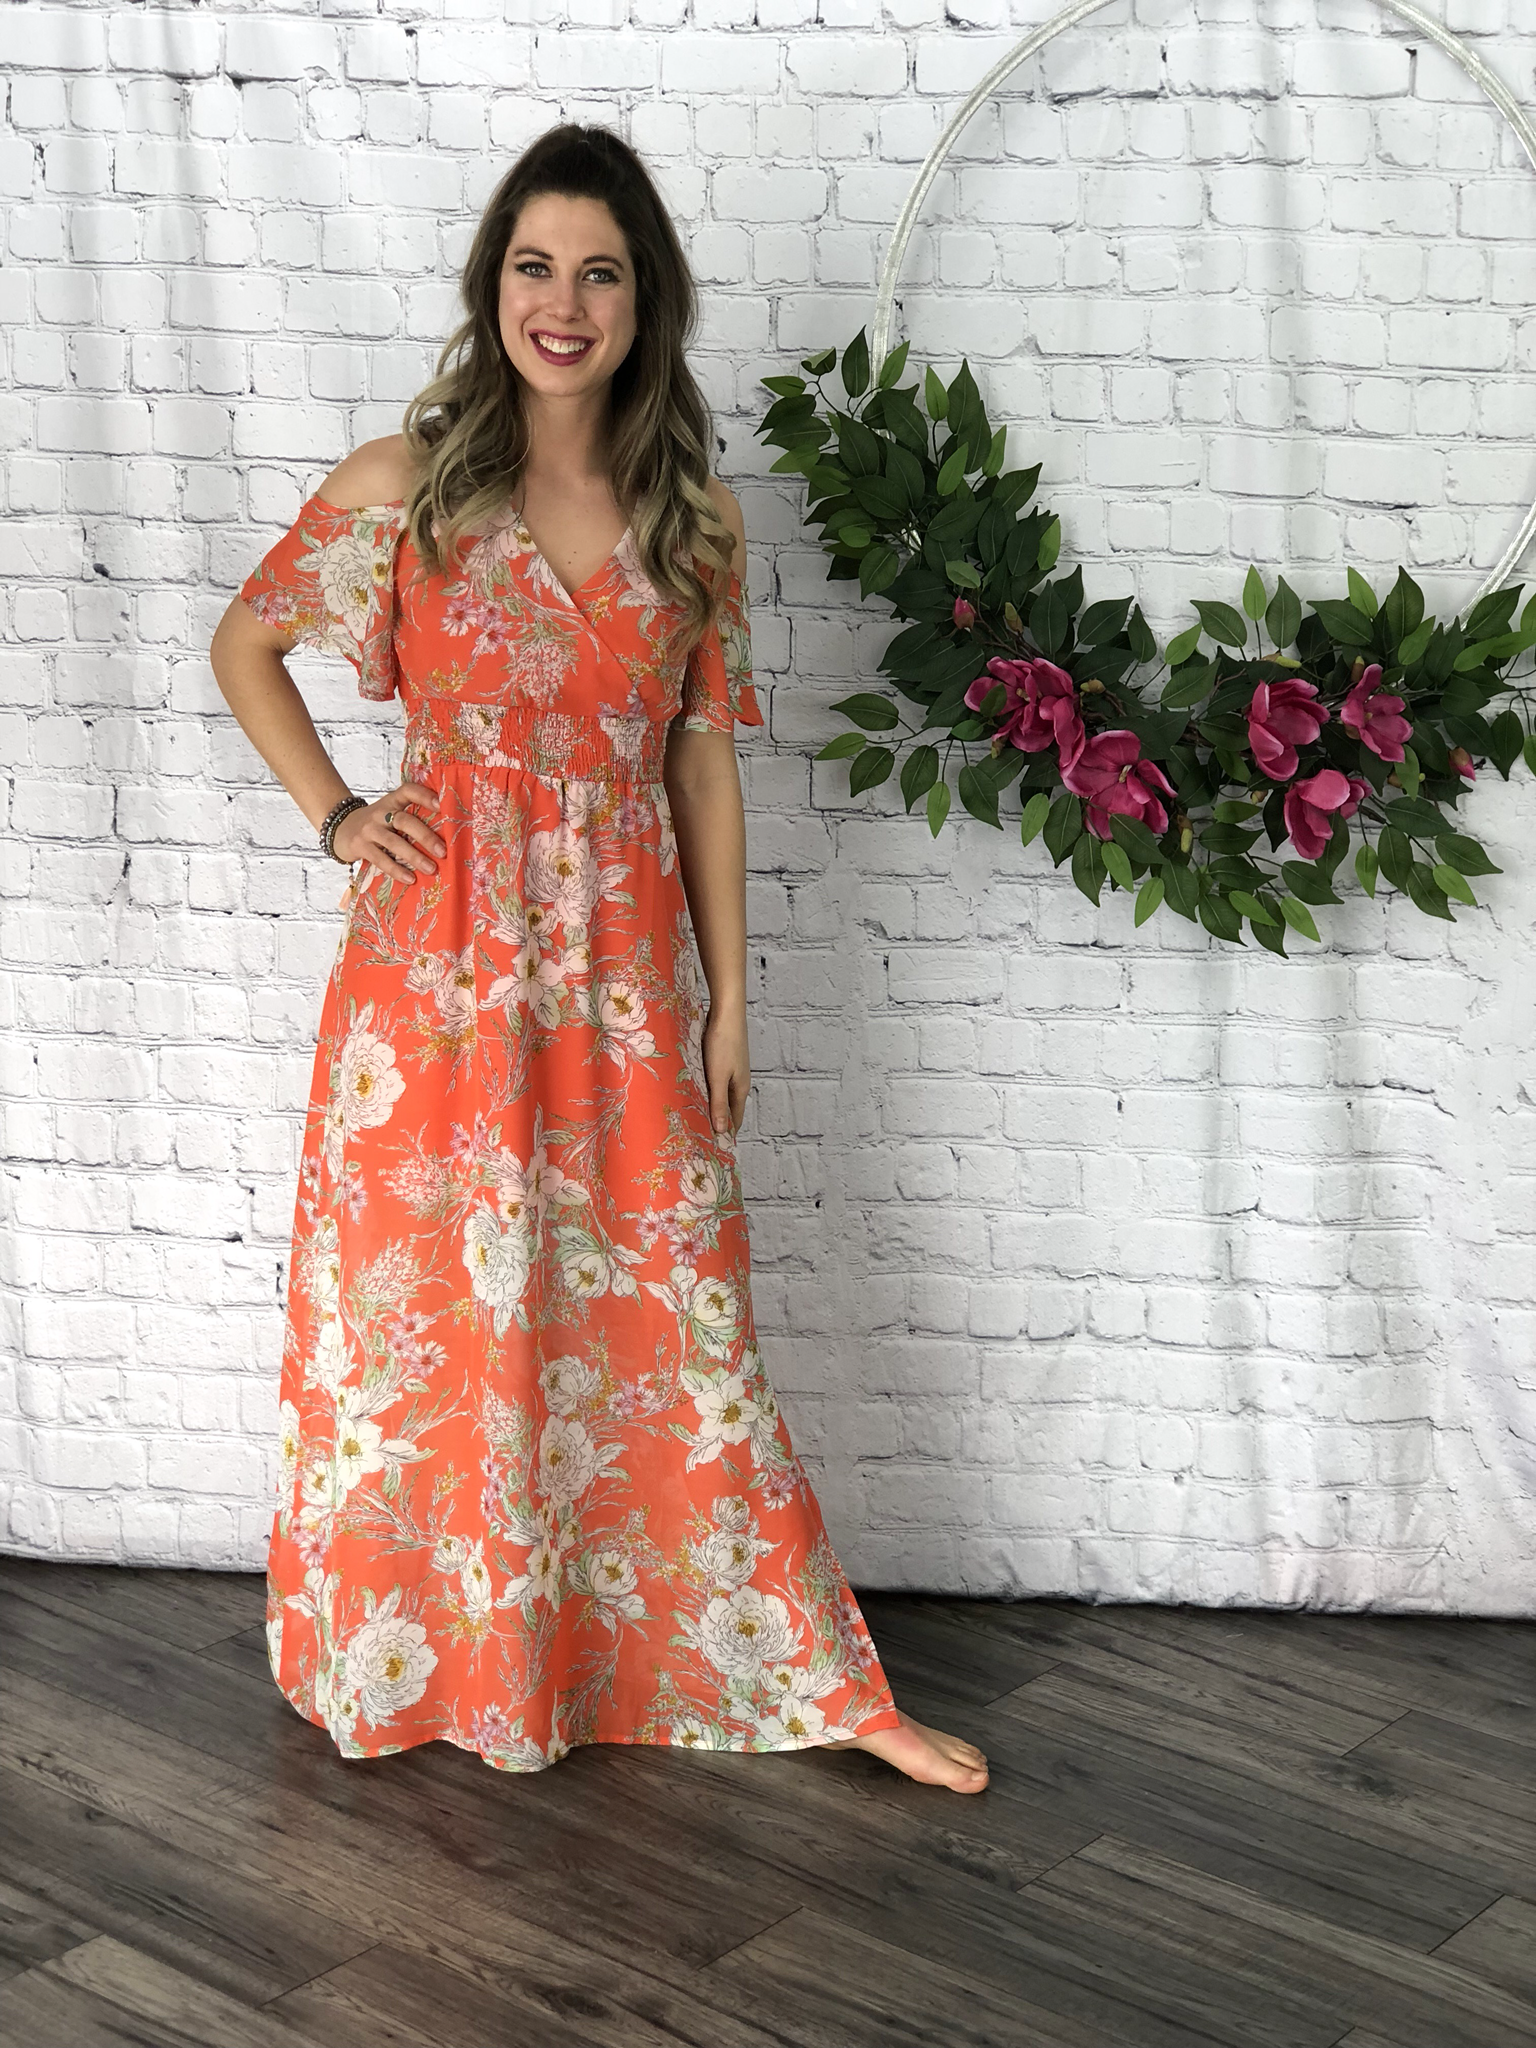 The Belle Dress